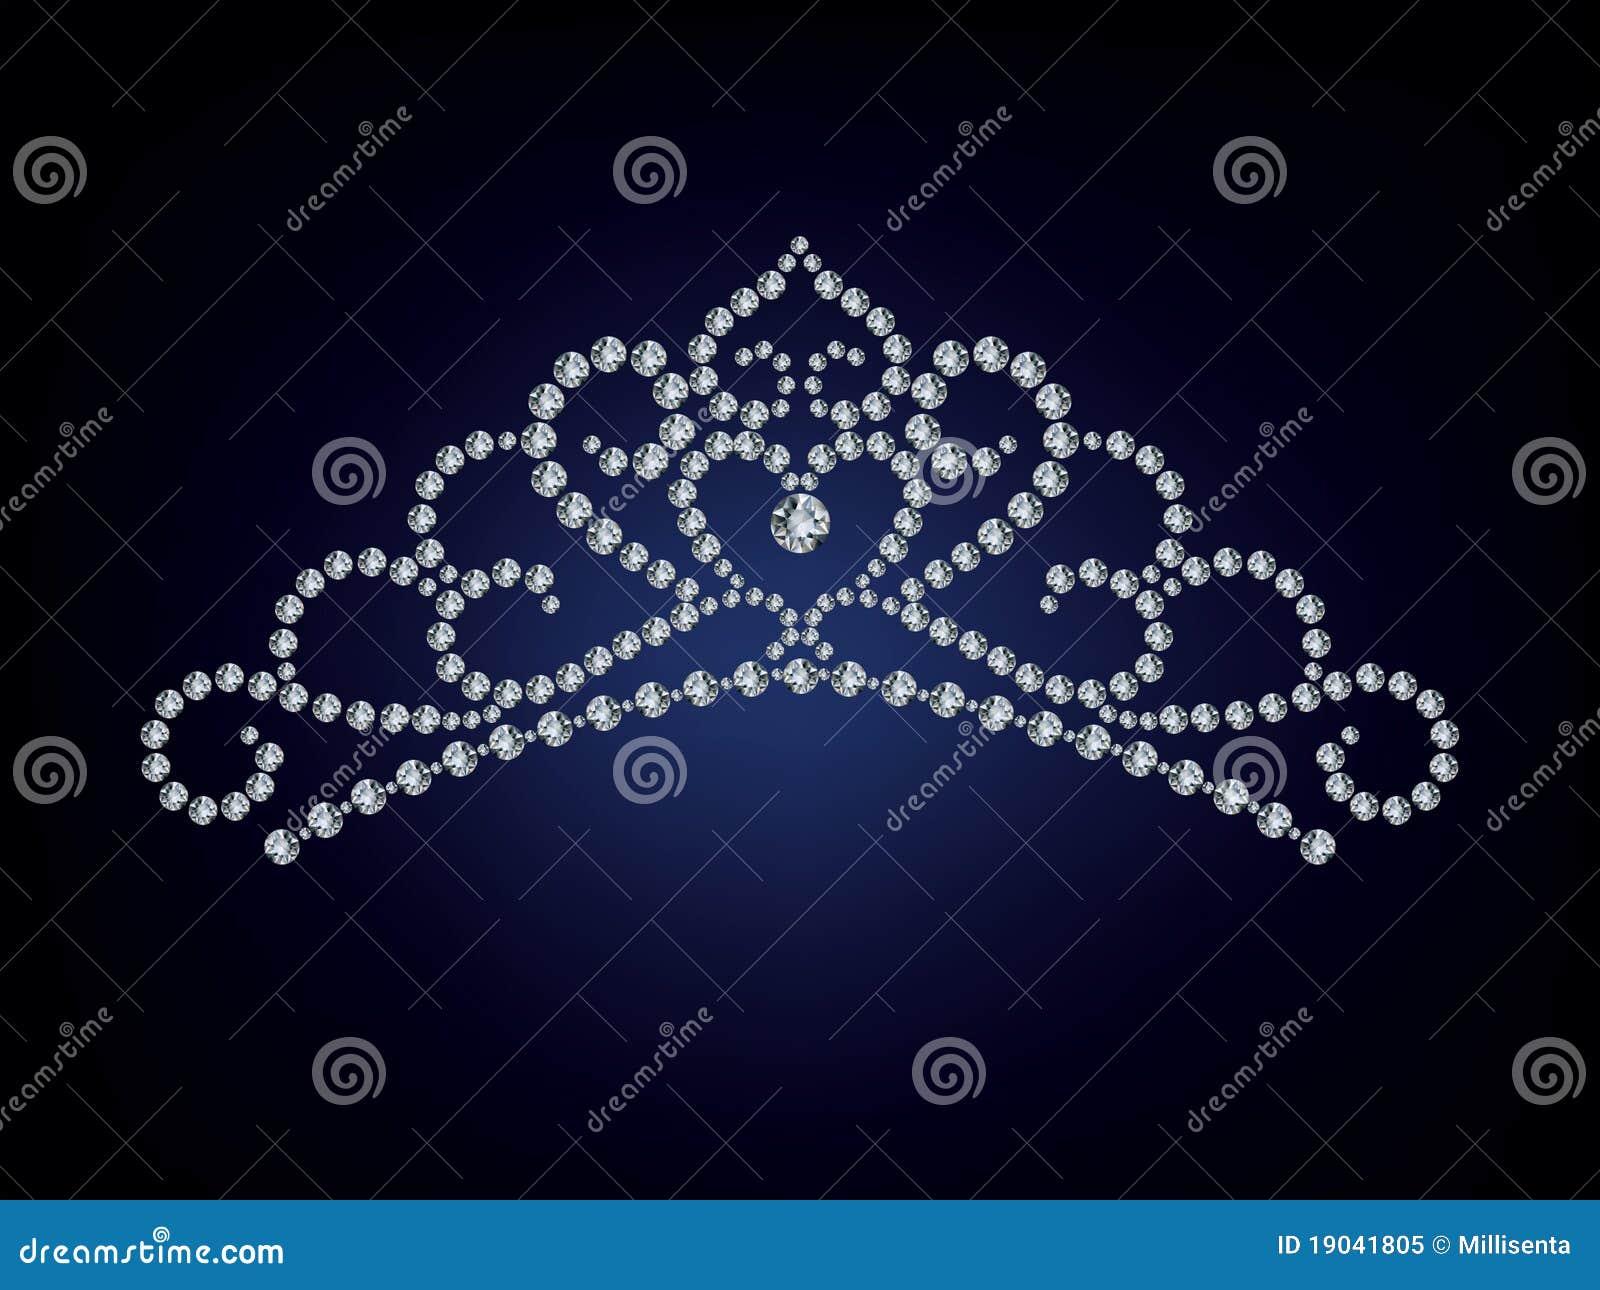 The Diamond tiara